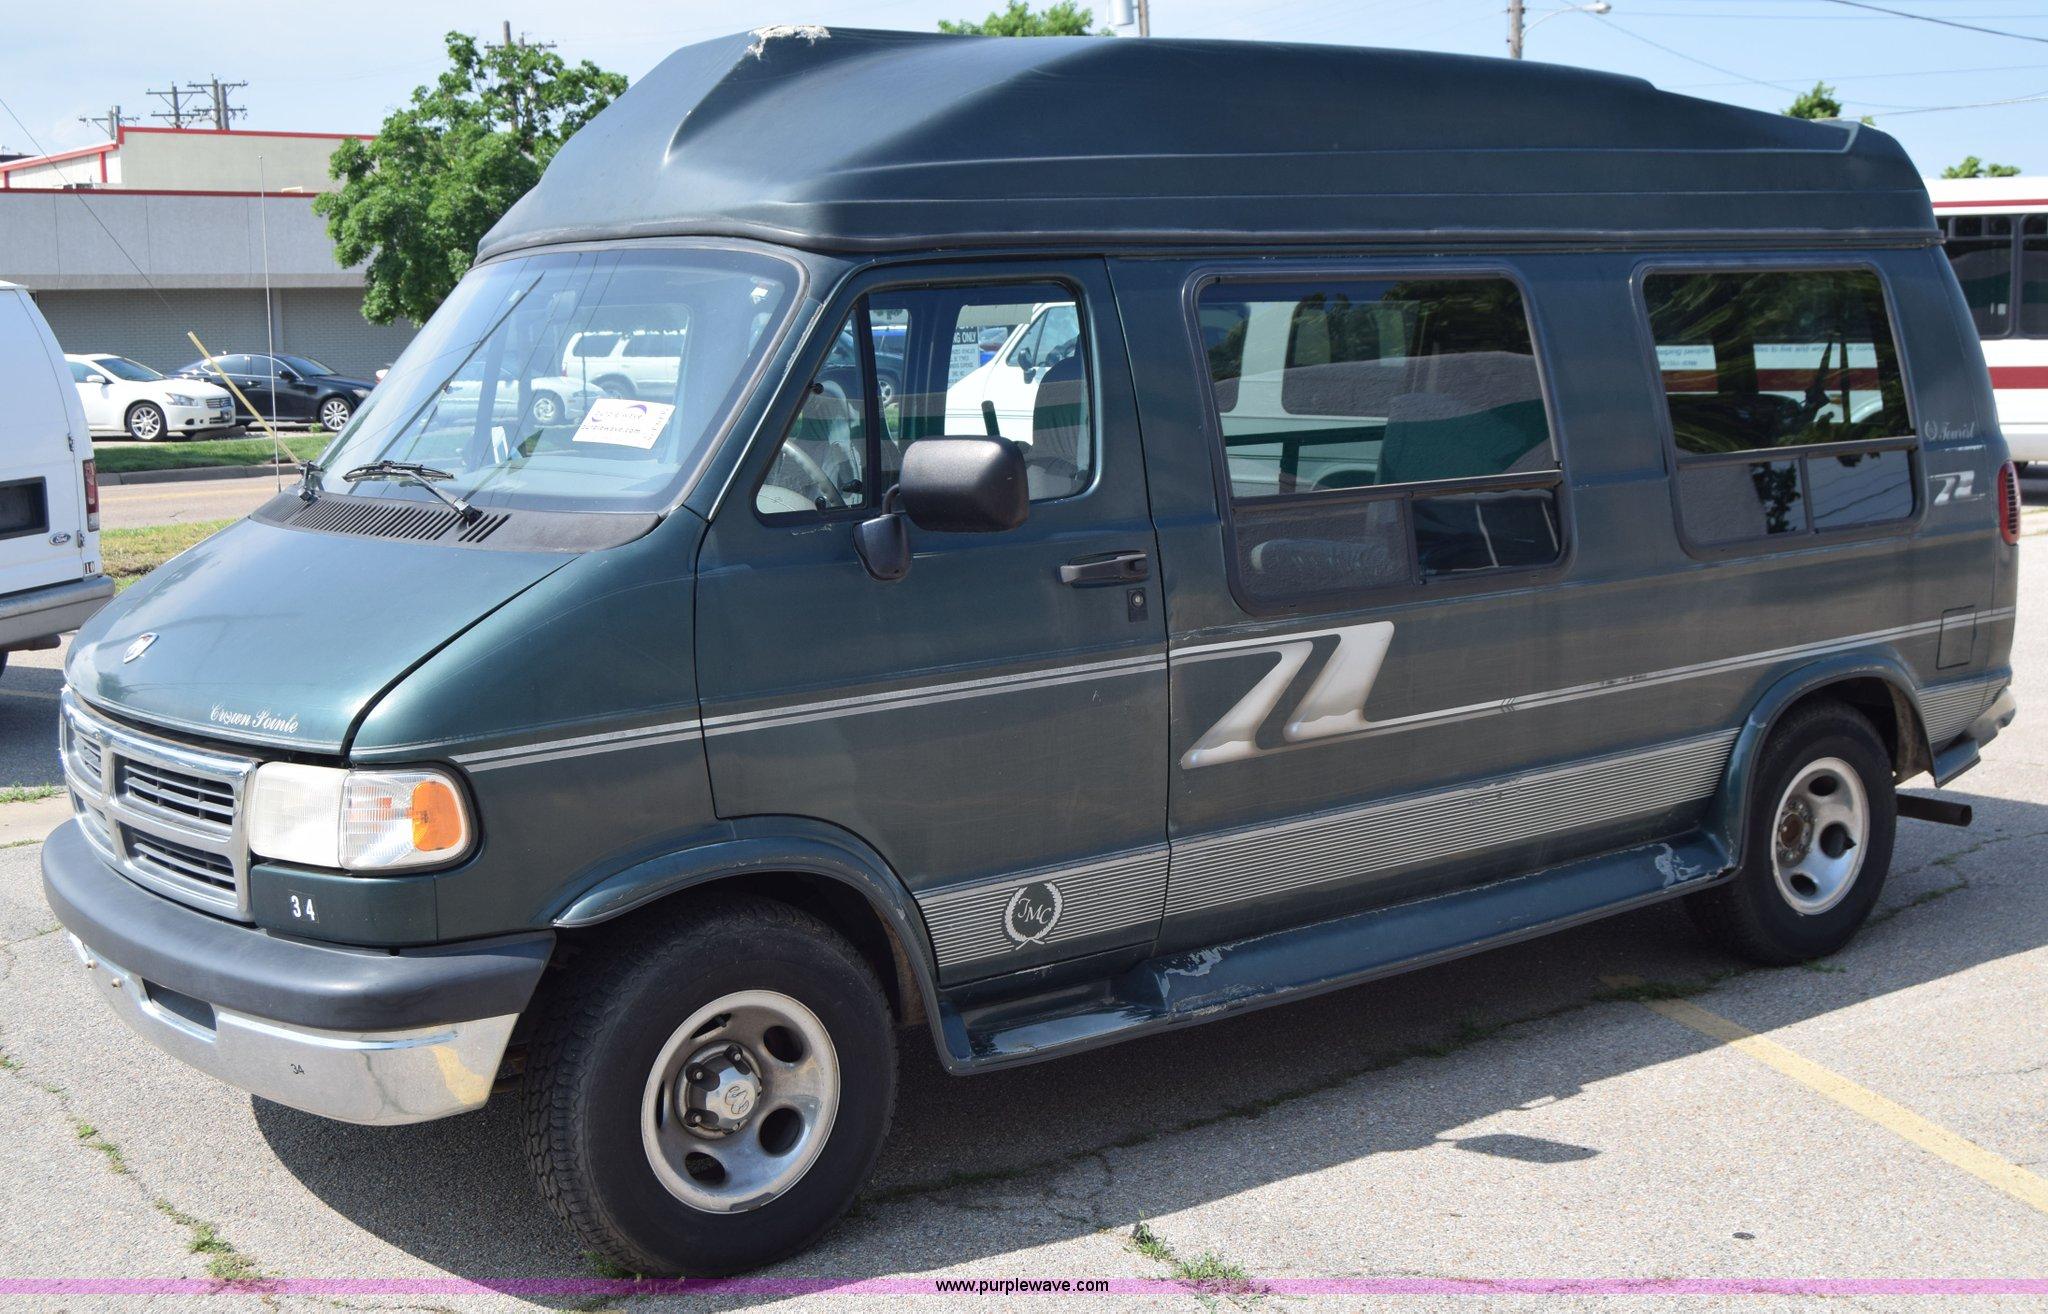 1996 Dodge Ram Van 2500 Extended Van In Wichita Ks Item E6435 Sold Purple Wave